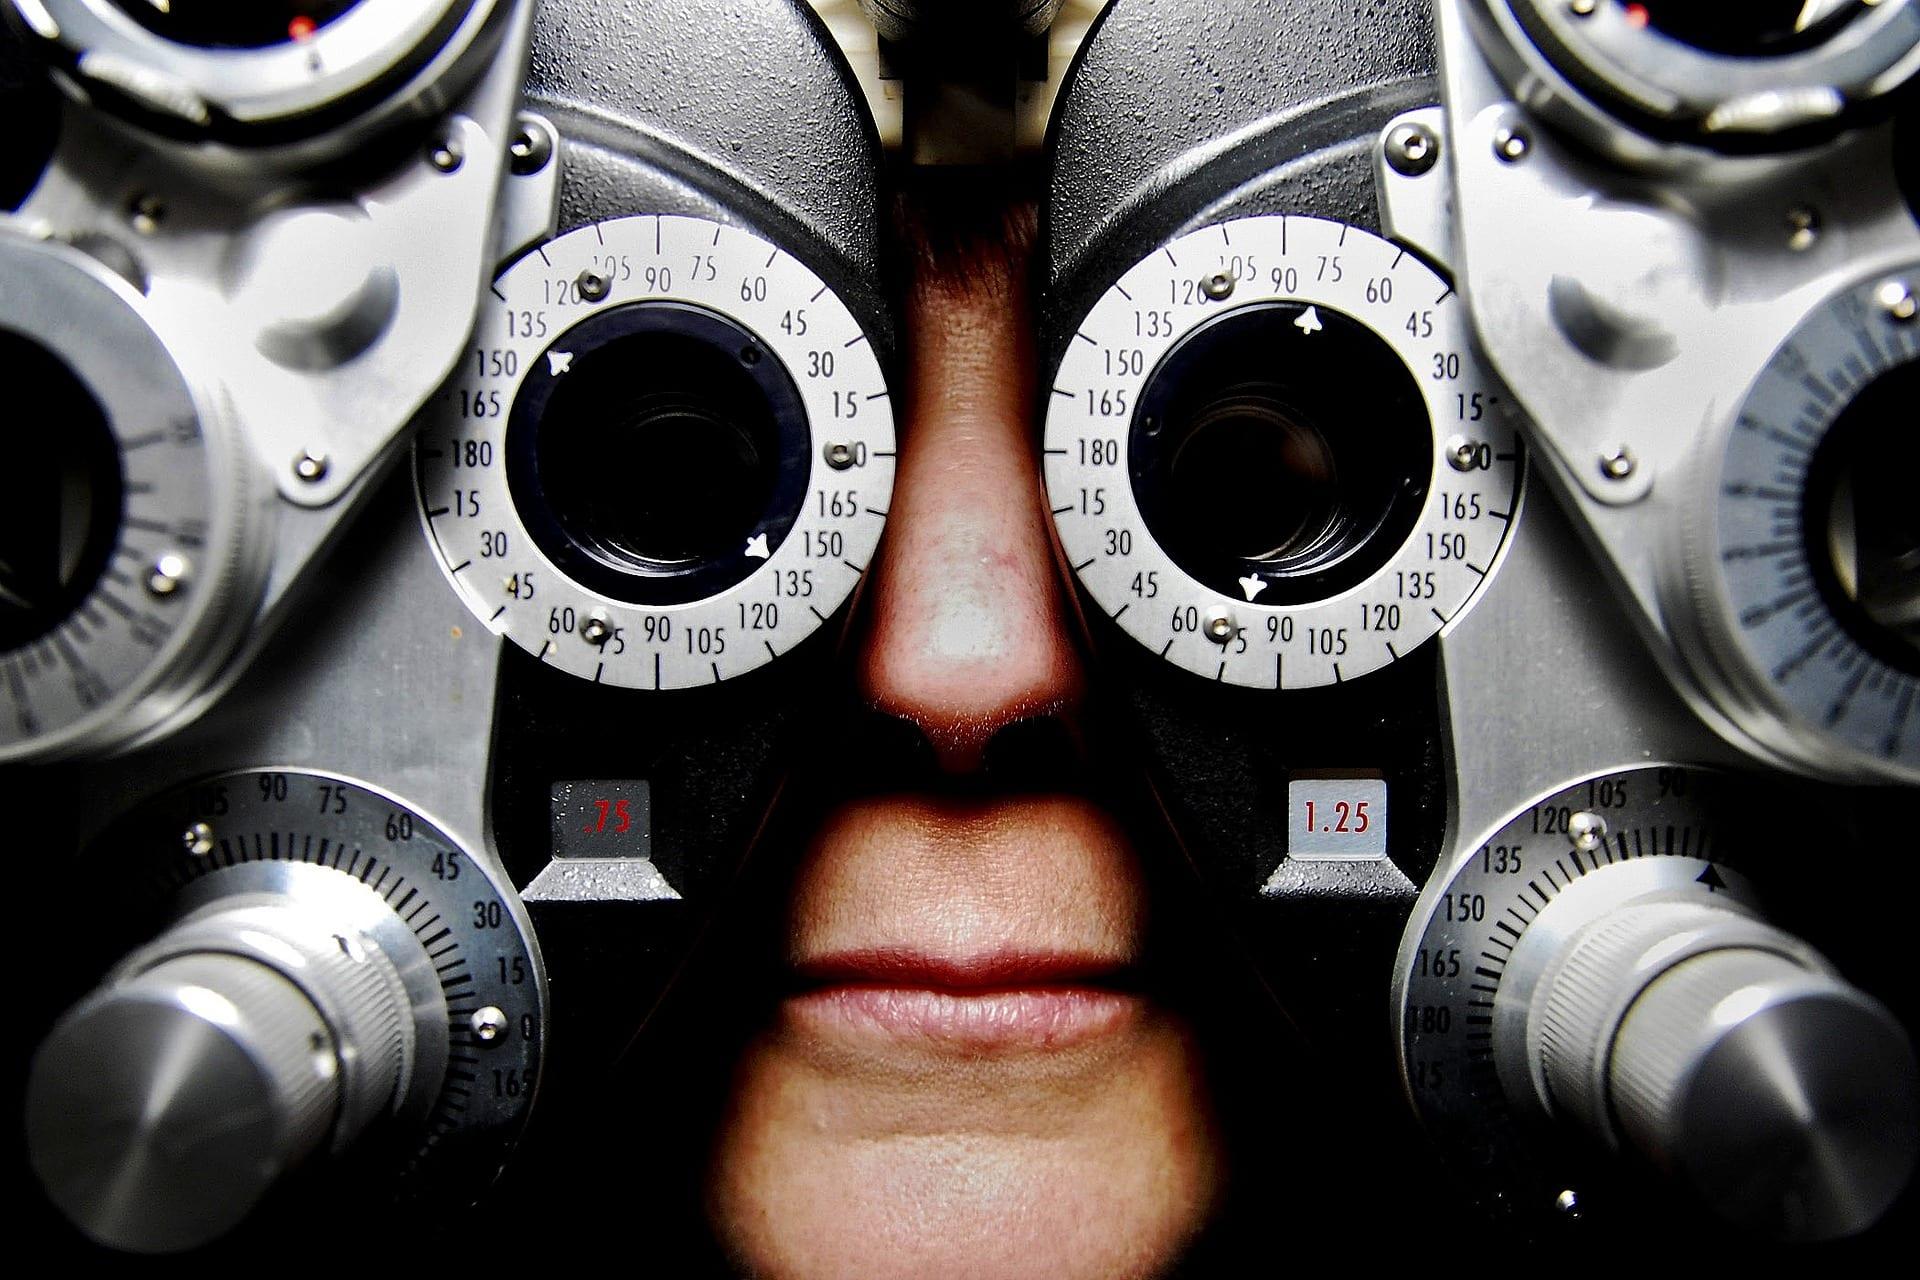 Intolerancia de las lentes de contacto-Lentes esclerales